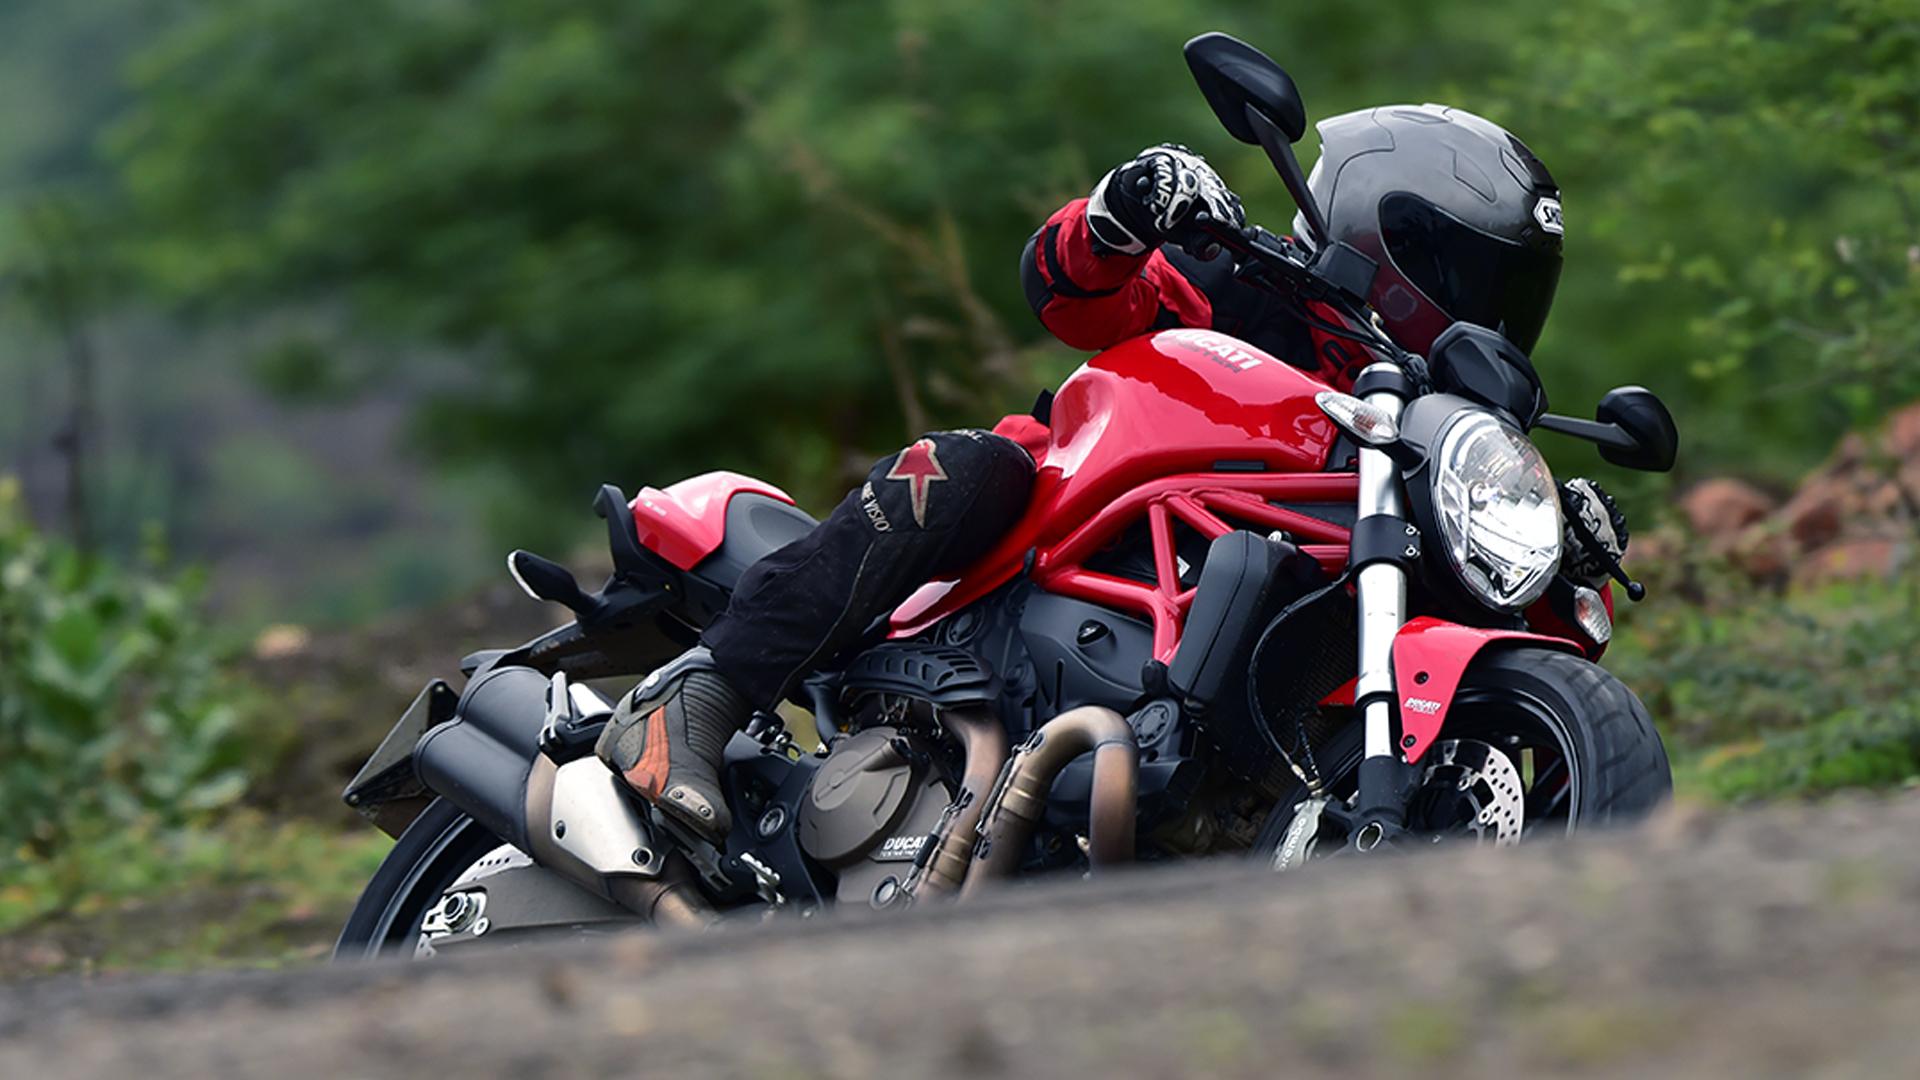 Ducati Monster 821 2015 STD